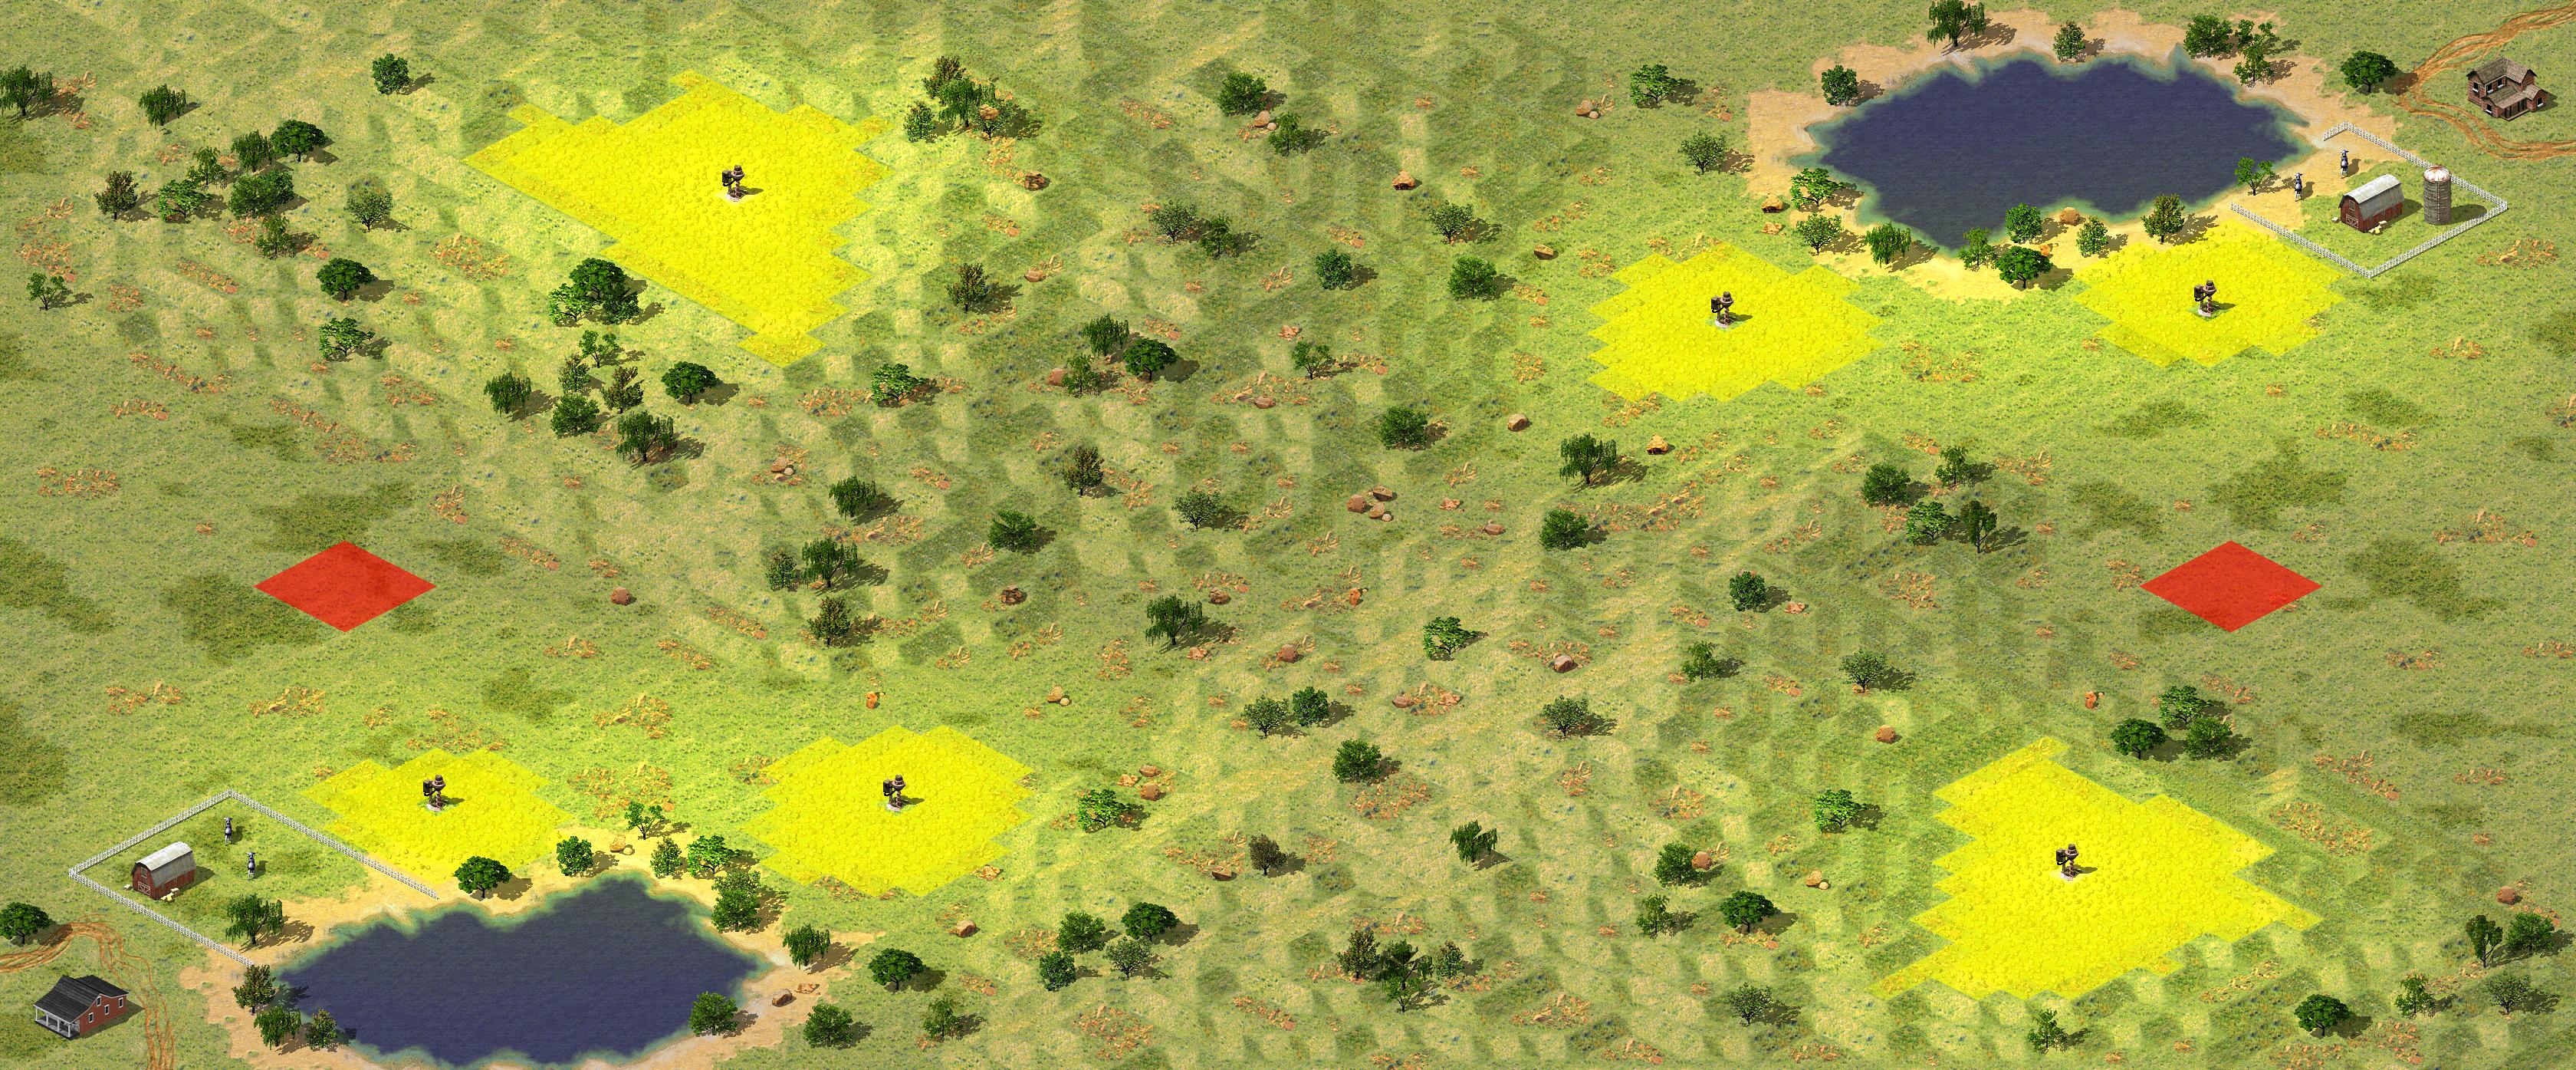 Blood Feud (Red Alert 2 map)